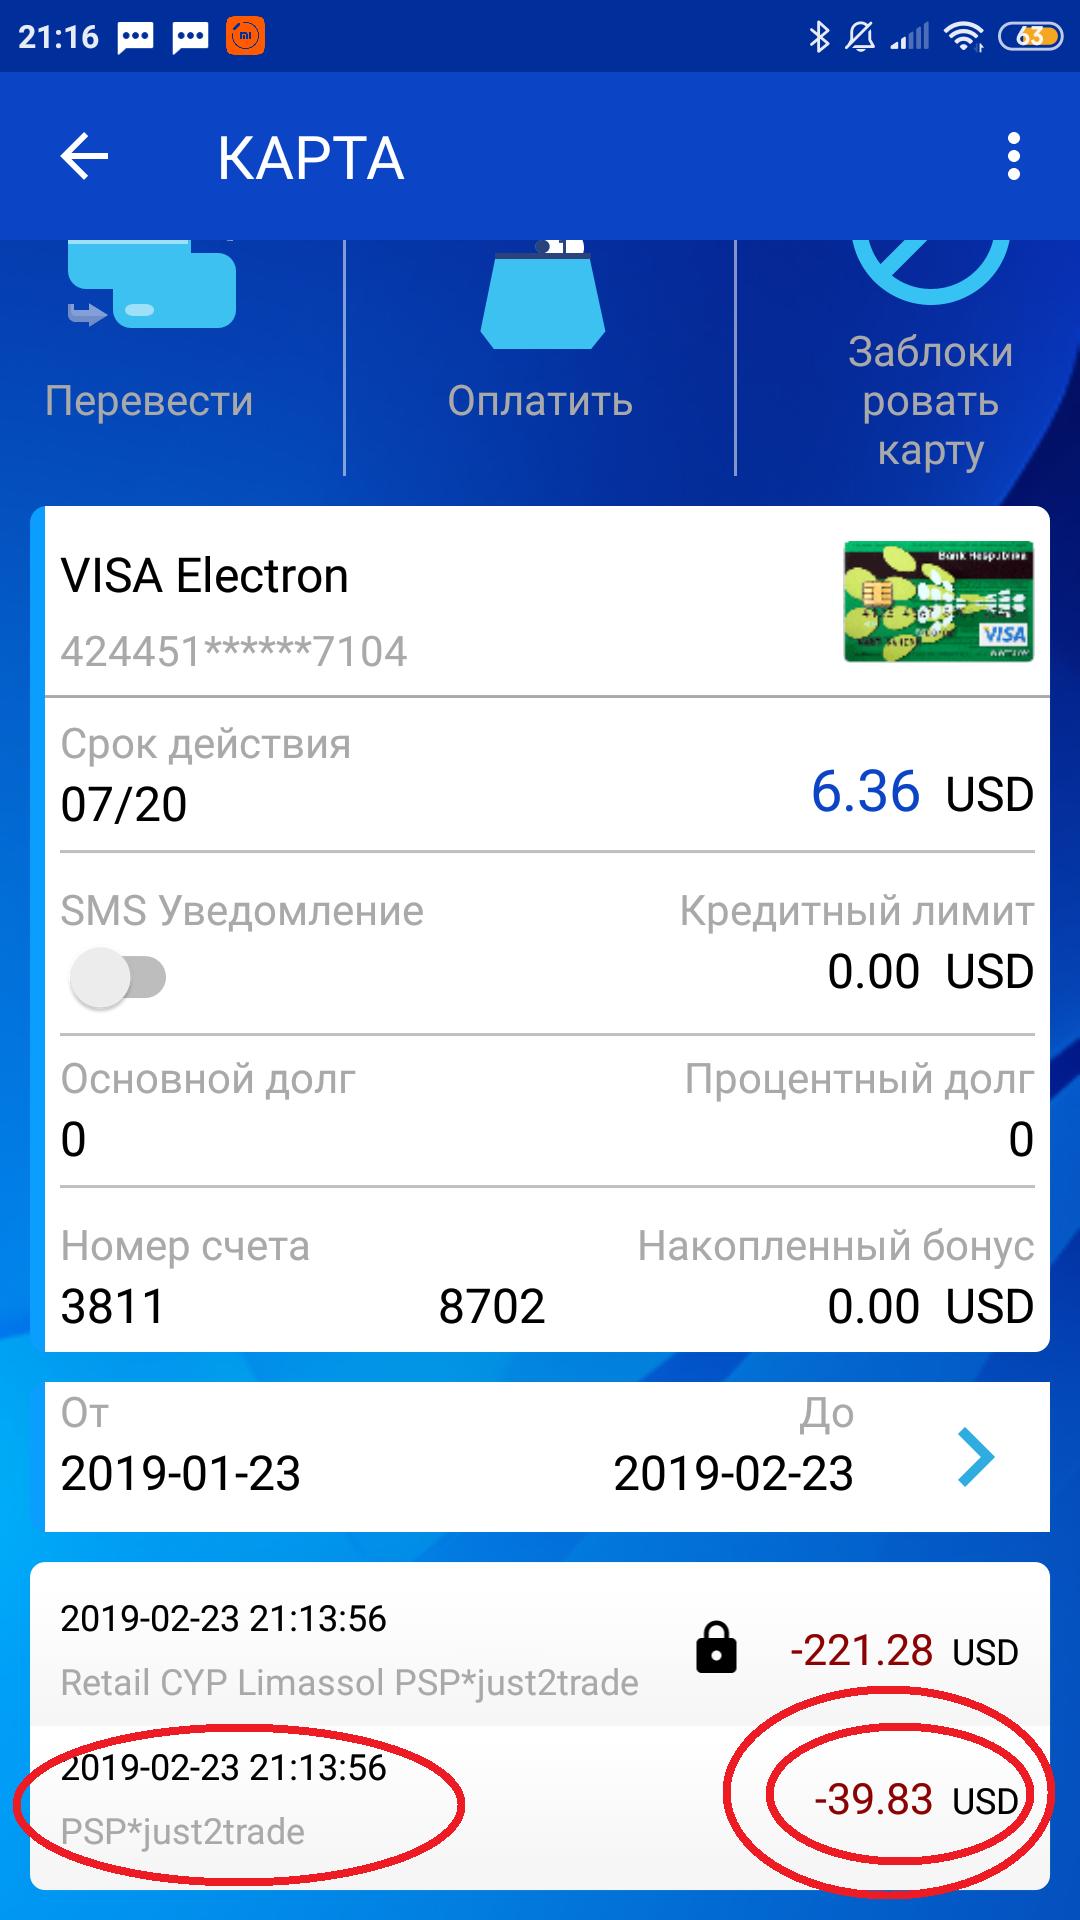 Биткоин just2trade отзывы курс рф рубля к доллару на форекс